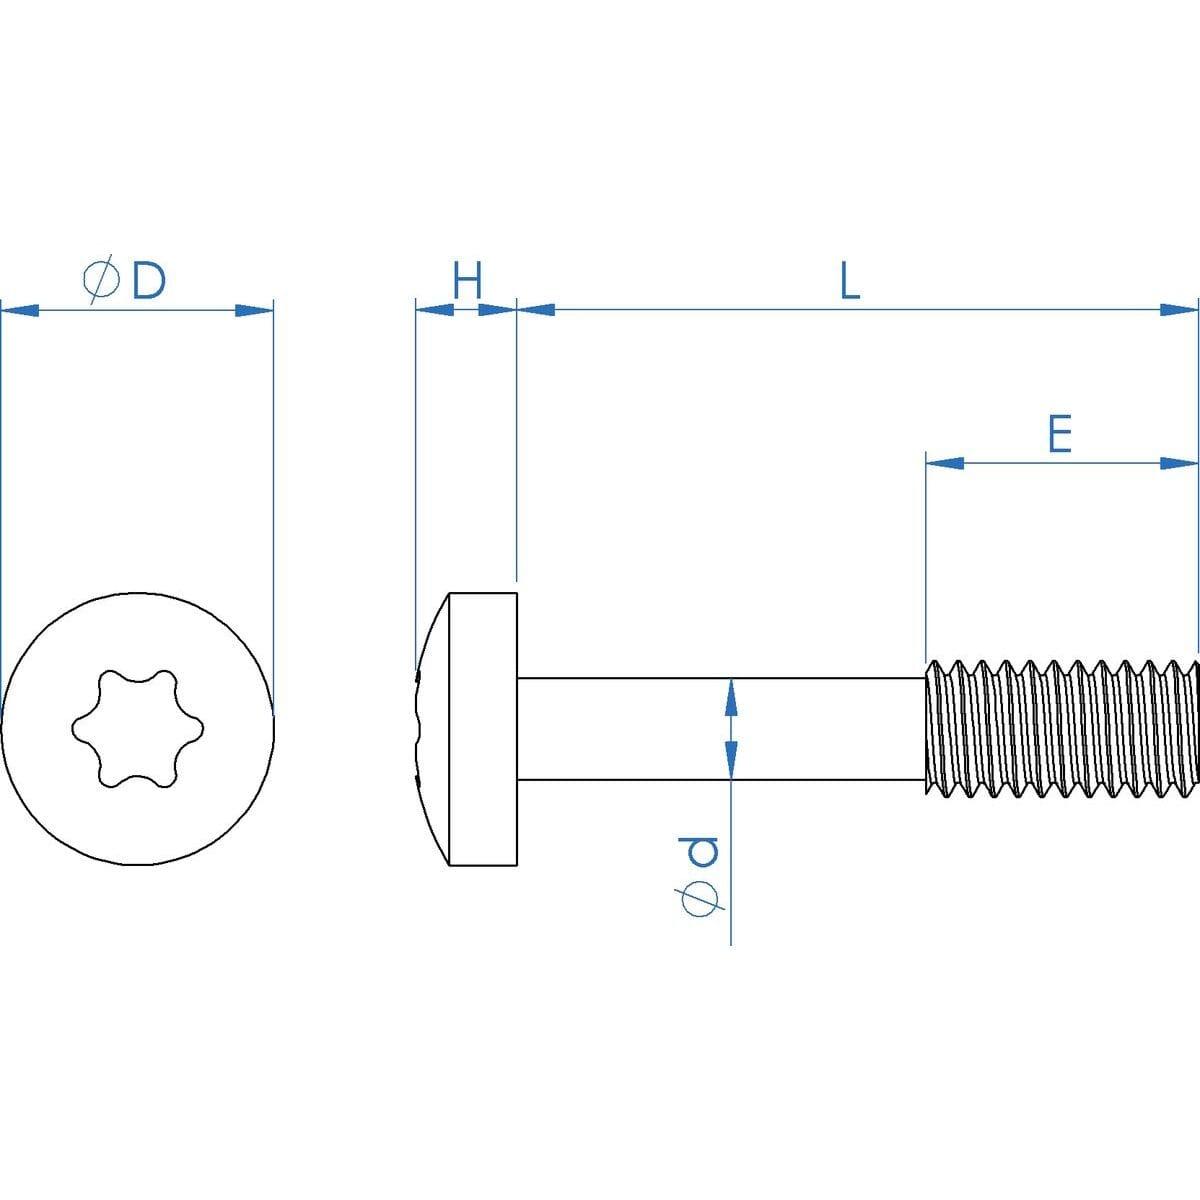 M4 x 20mm Torx Pan Head Captive Screws (DIN 7985) - Thread Locking Stainless Steel (A2) Drawing